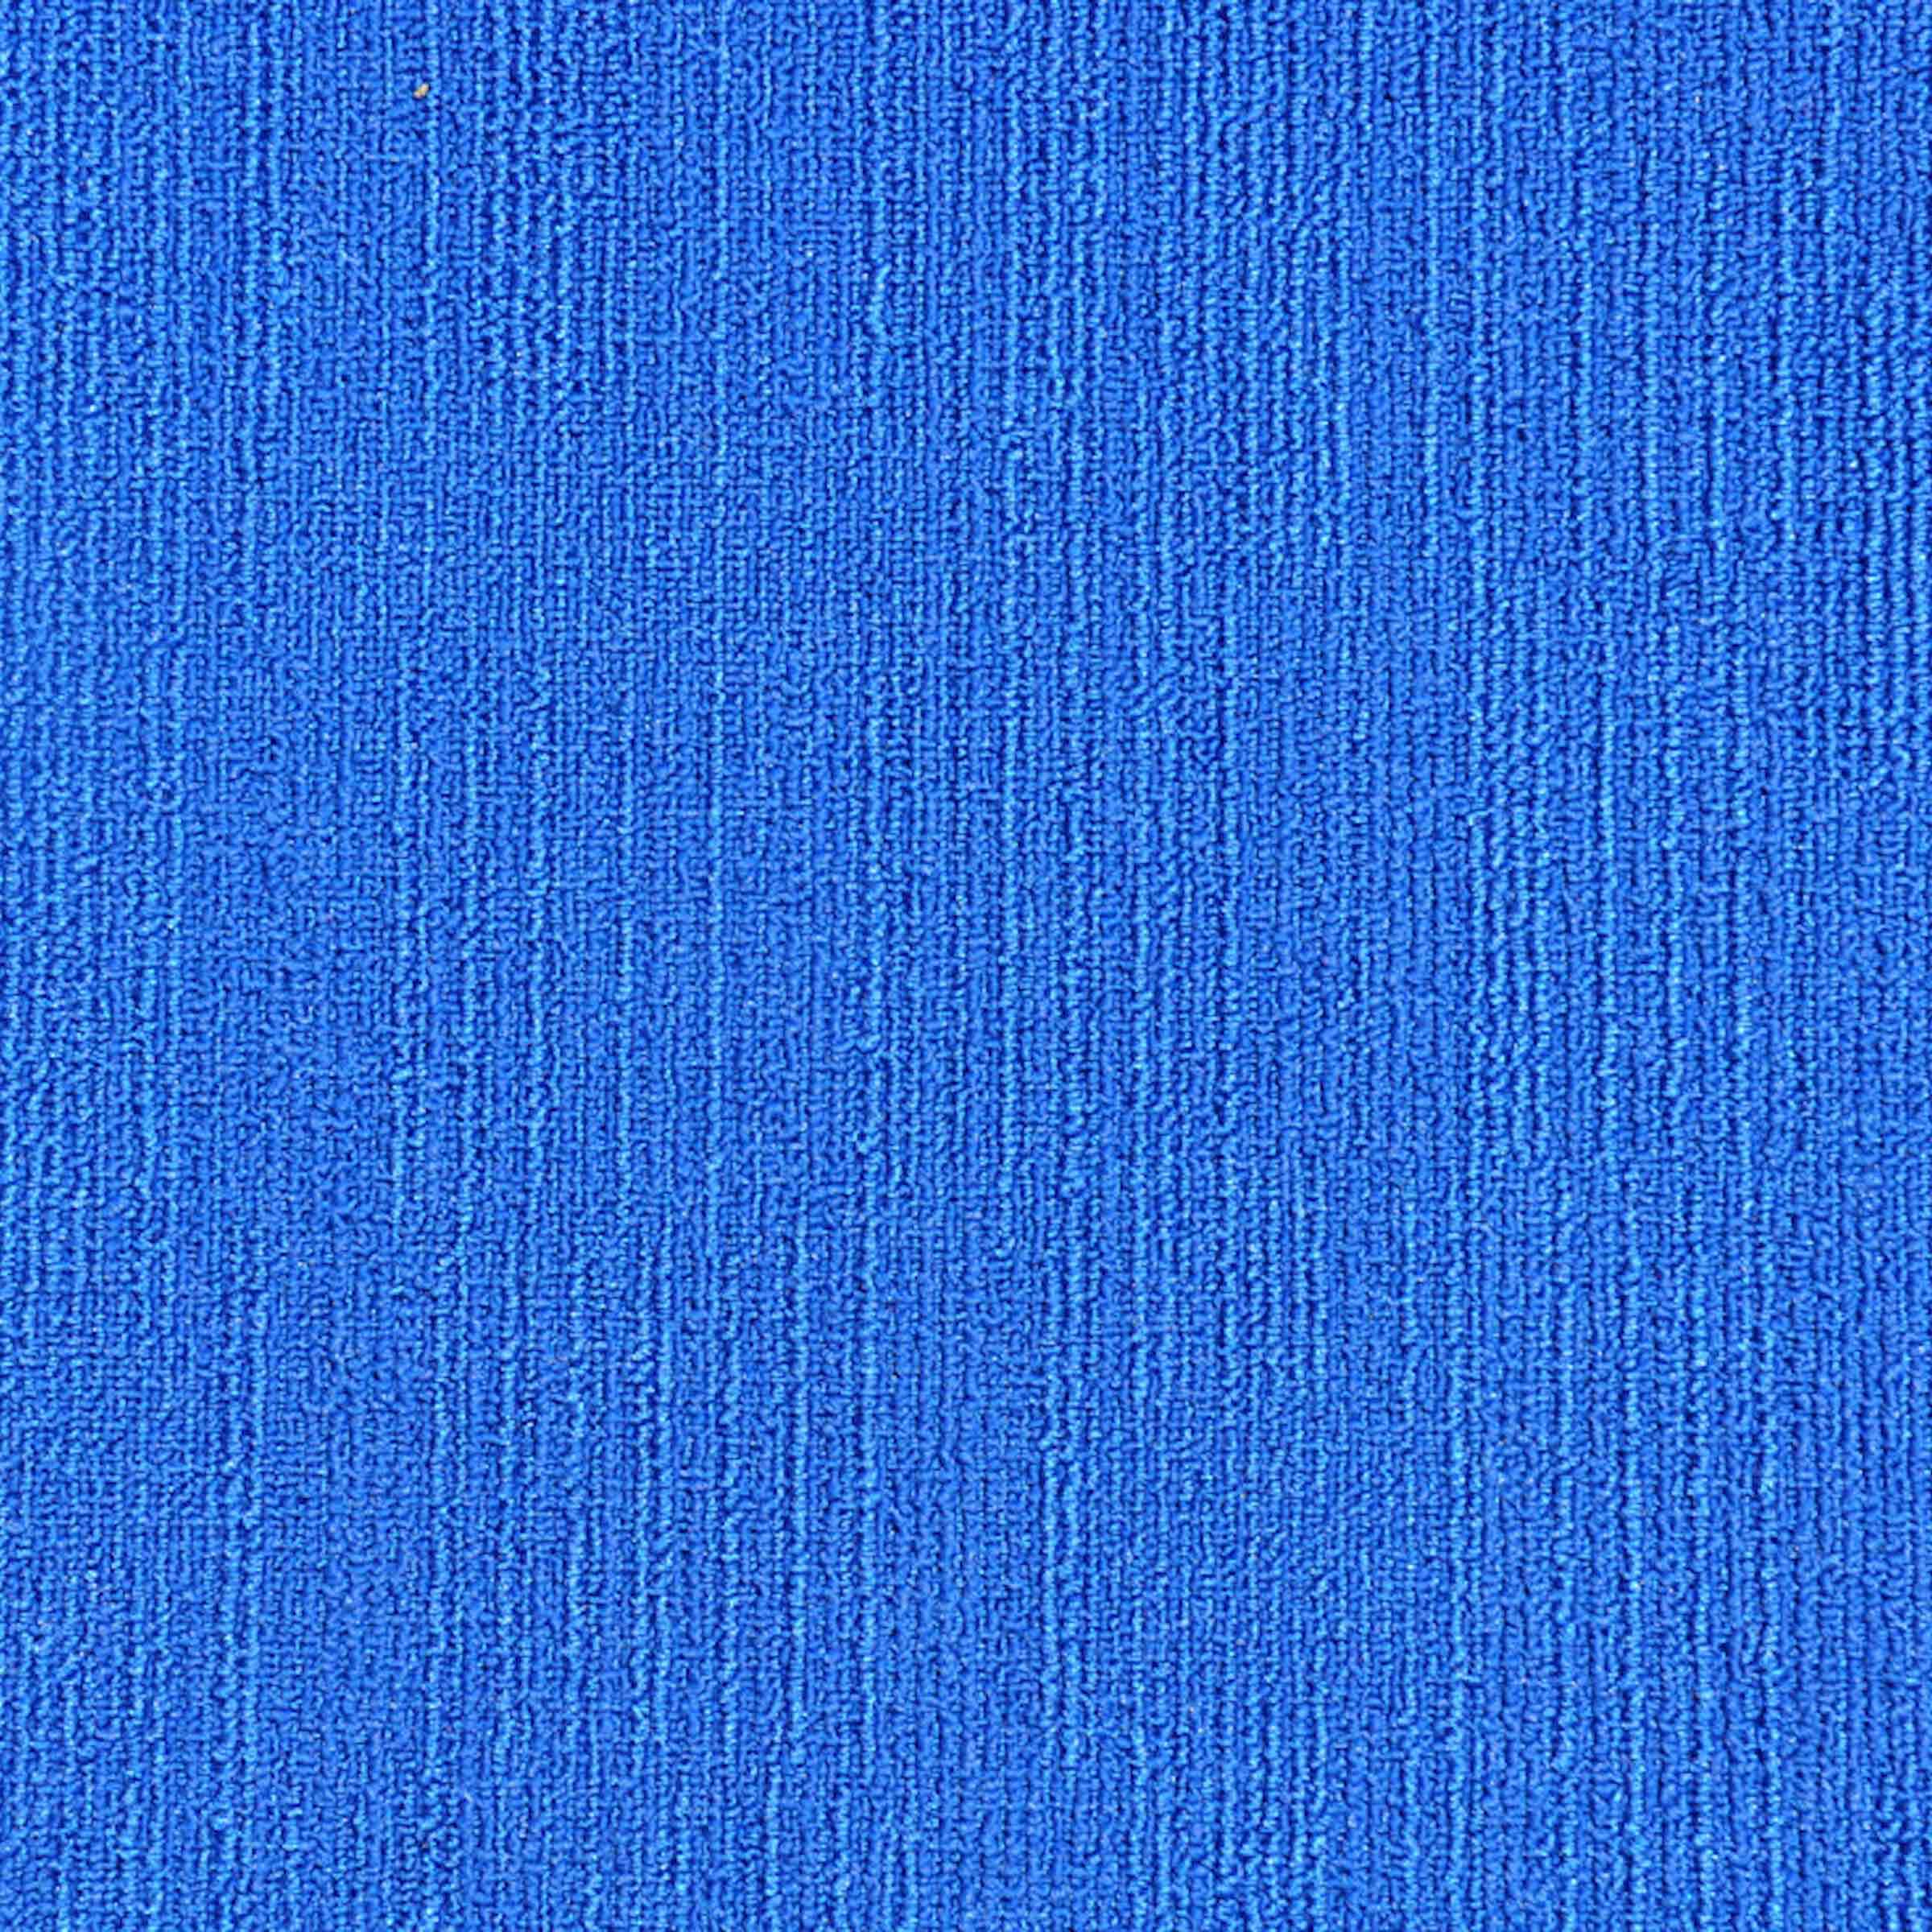 Highlights 3 Multi-Level | 65803 | Paragon Carpet Tiles | Commercial Carpet Tiles